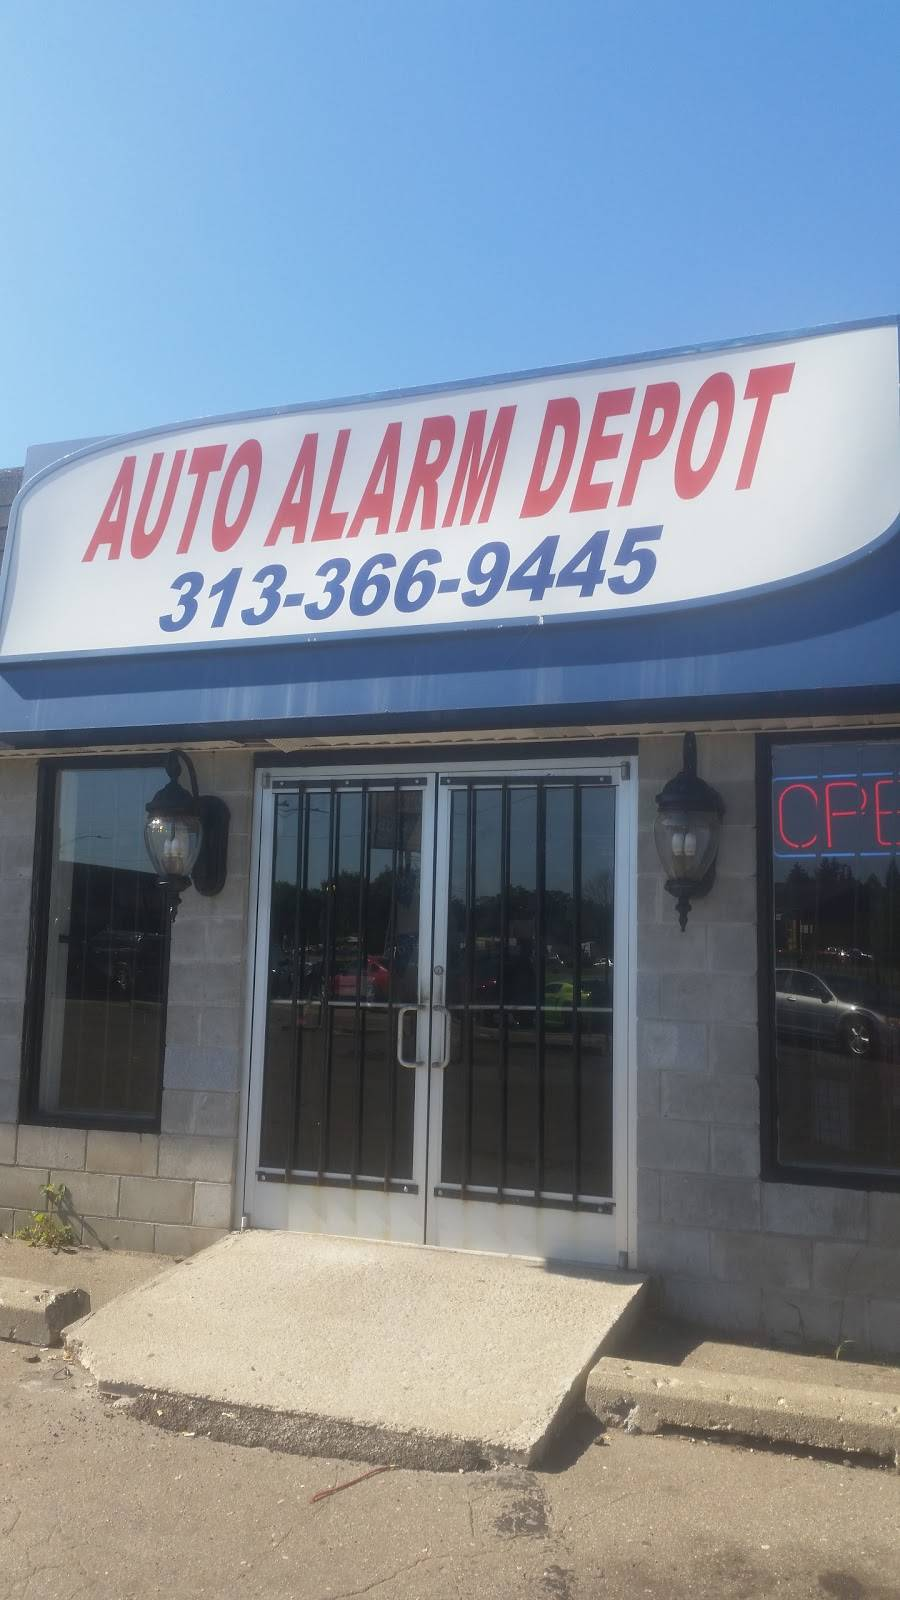 Detroit Auto Sound - car repair  | Photo 7 of 7 | Address: 3840 E 8 Mile Rd, Detroit, MI 48234, USA | Phone: (313) 366-9445